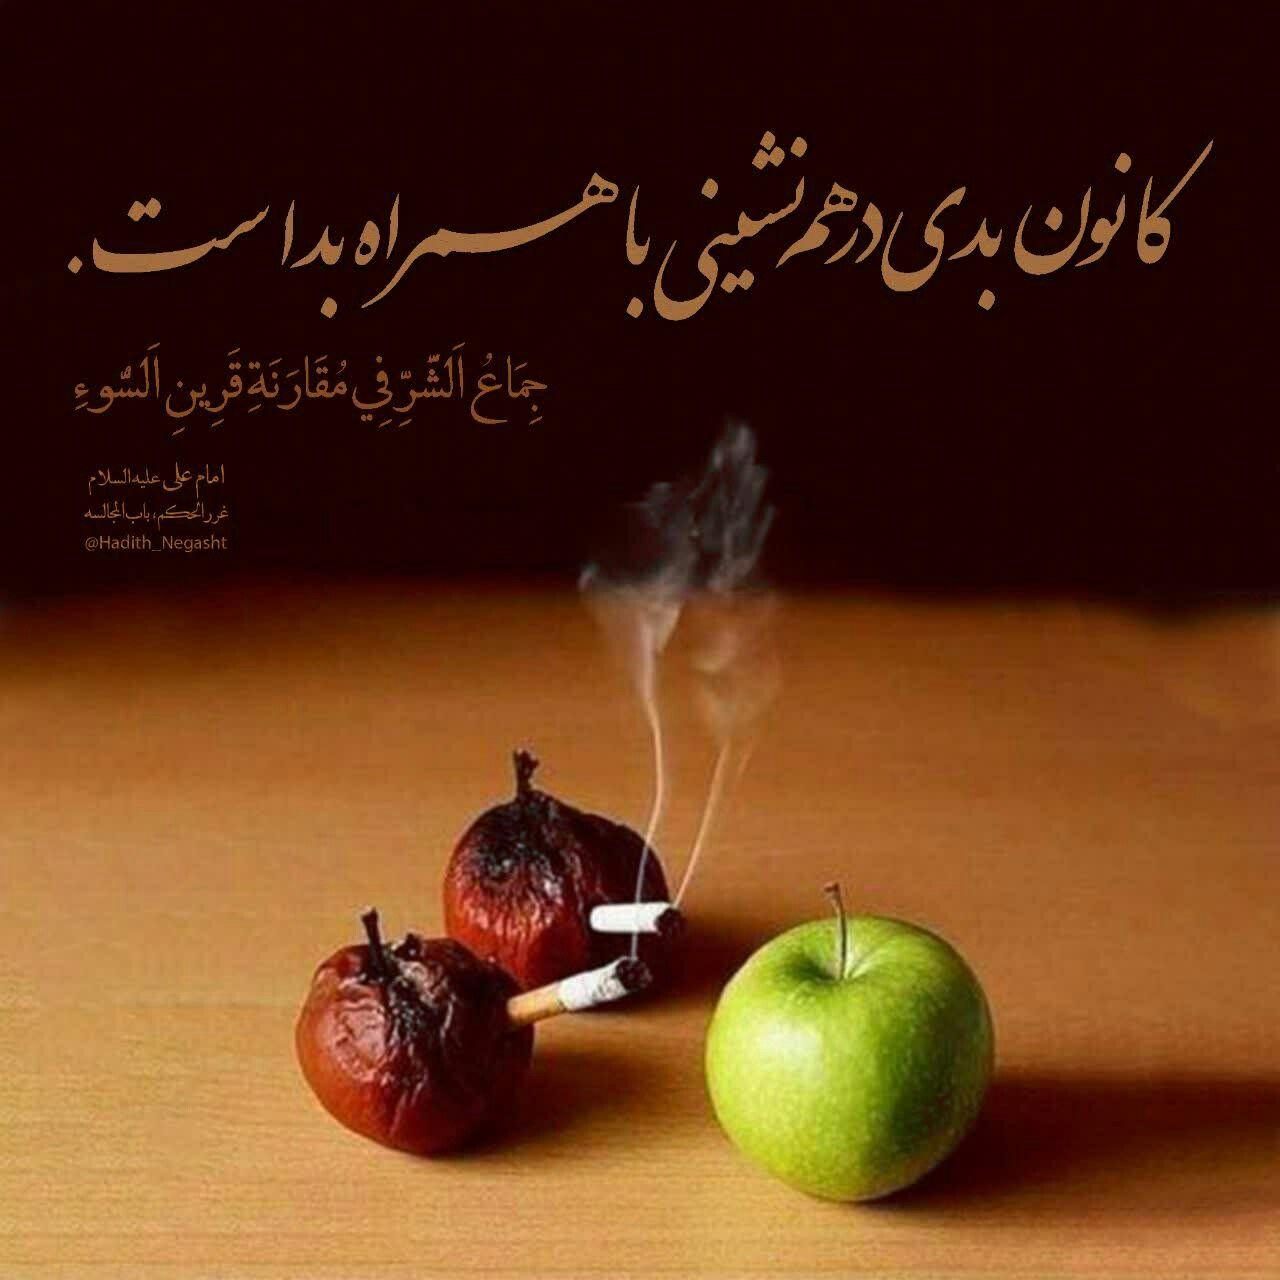 Pin By Samantha Ramirez On God S Warmth Islamic Quotes Wallpaper Holy Quran Hadith